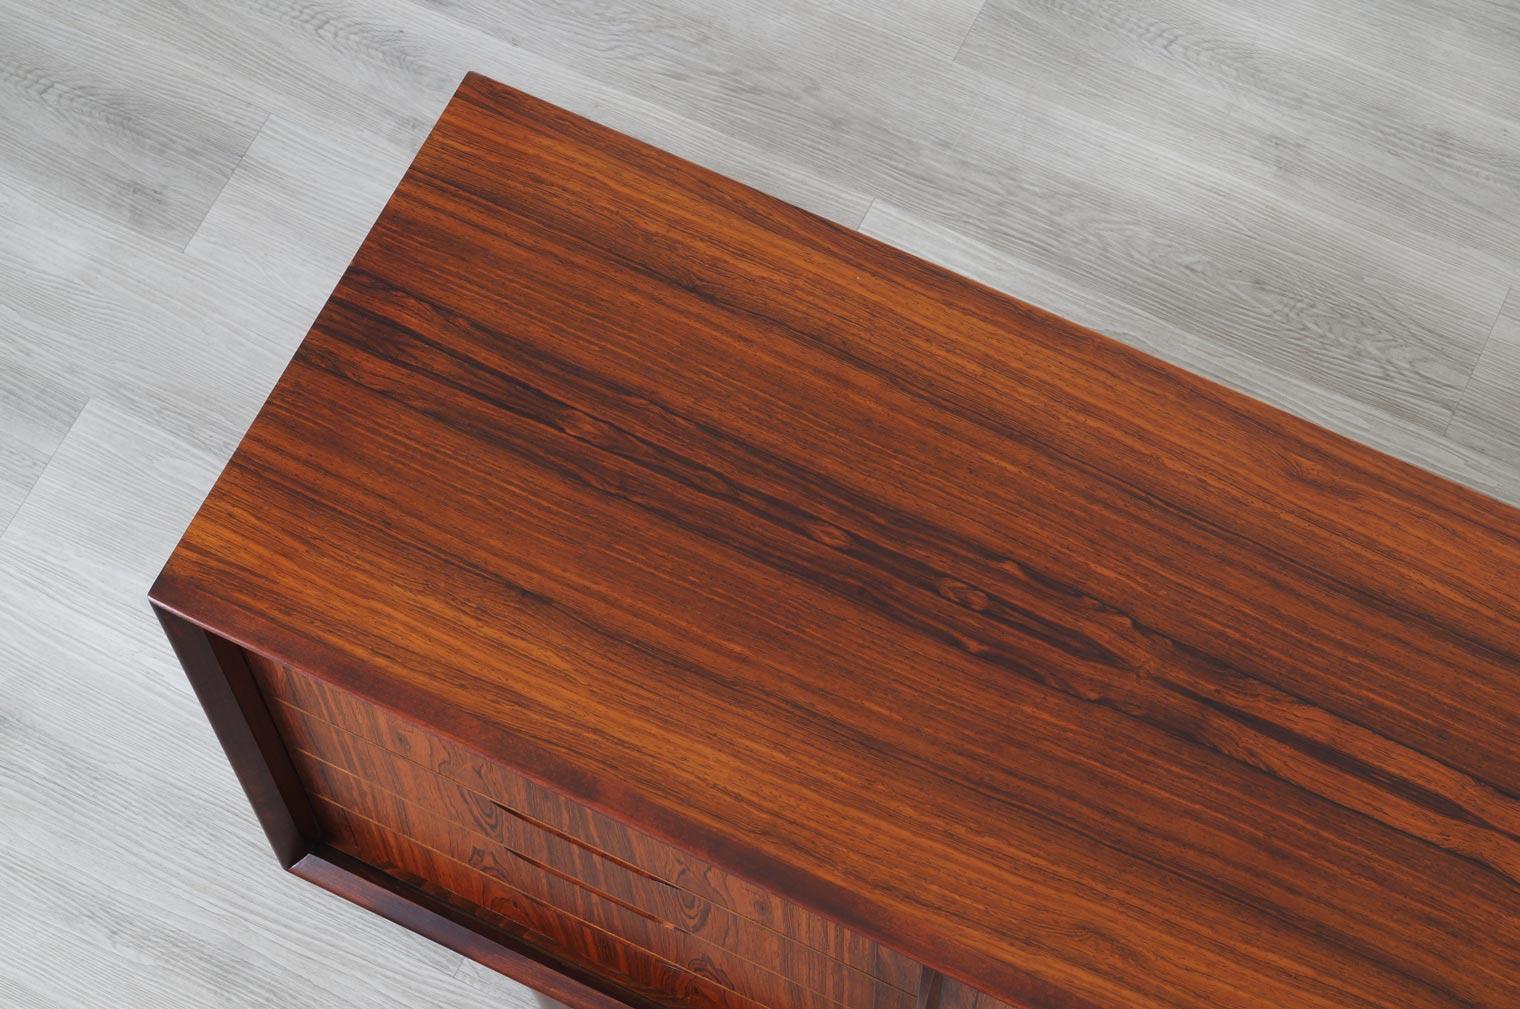 Mid Century Swedish Rosewood Sideboard by Svante Skogh